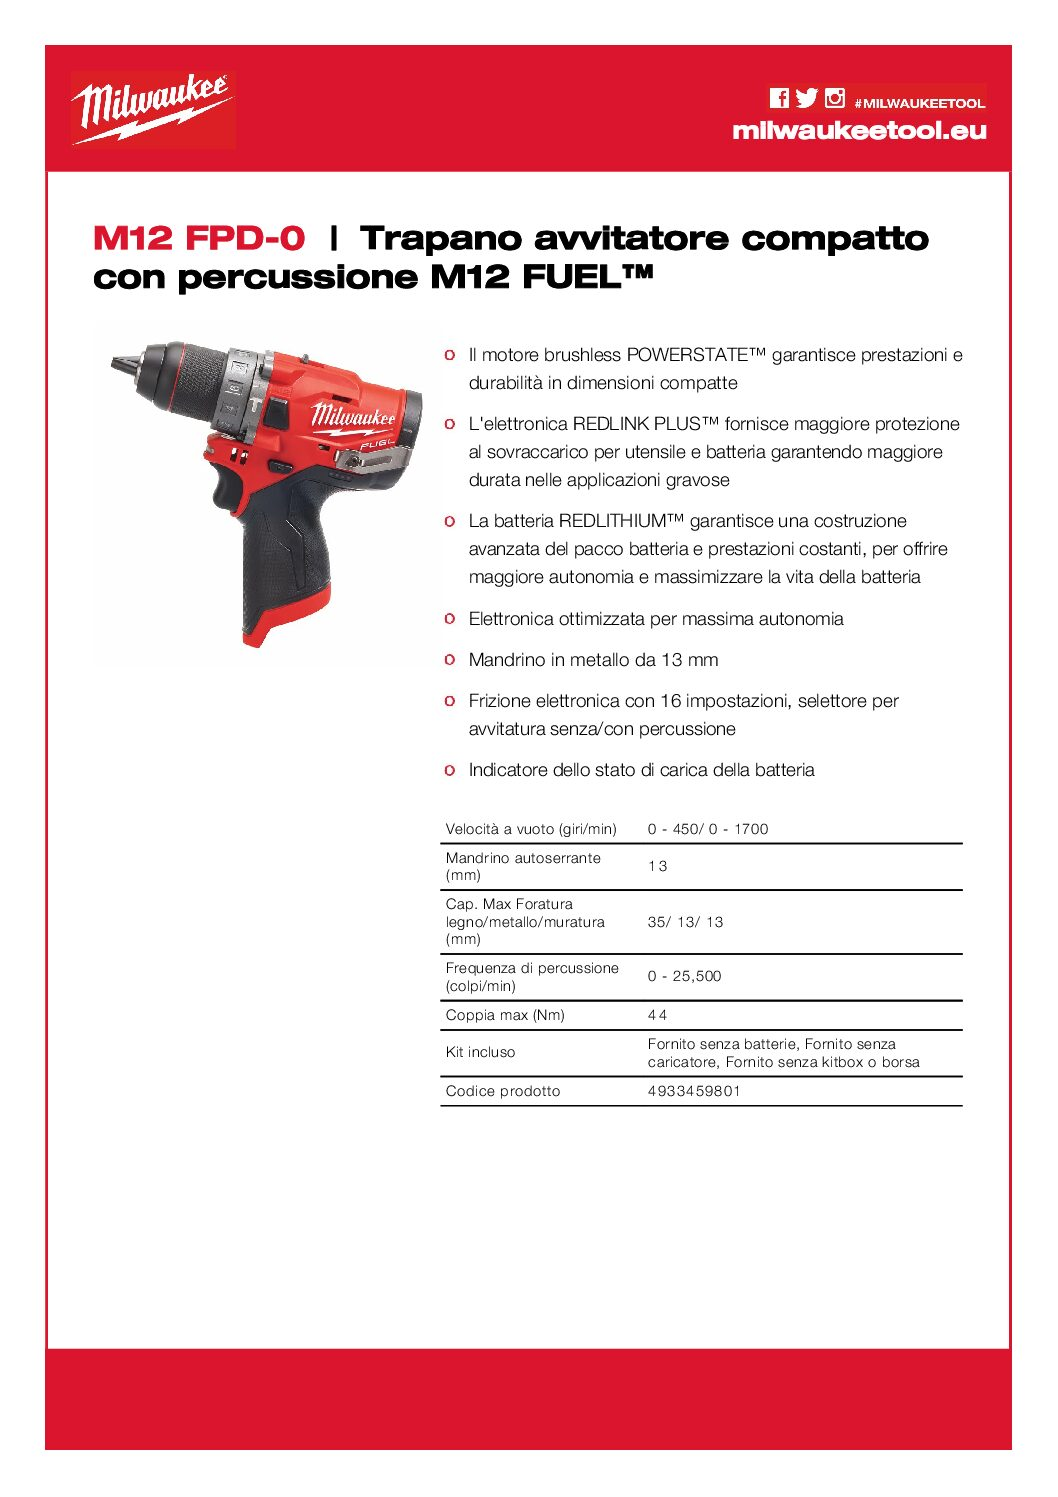 Kit 12V Tassellatore SDS + Trapano Avvitatore M12 FPD 0 pdf